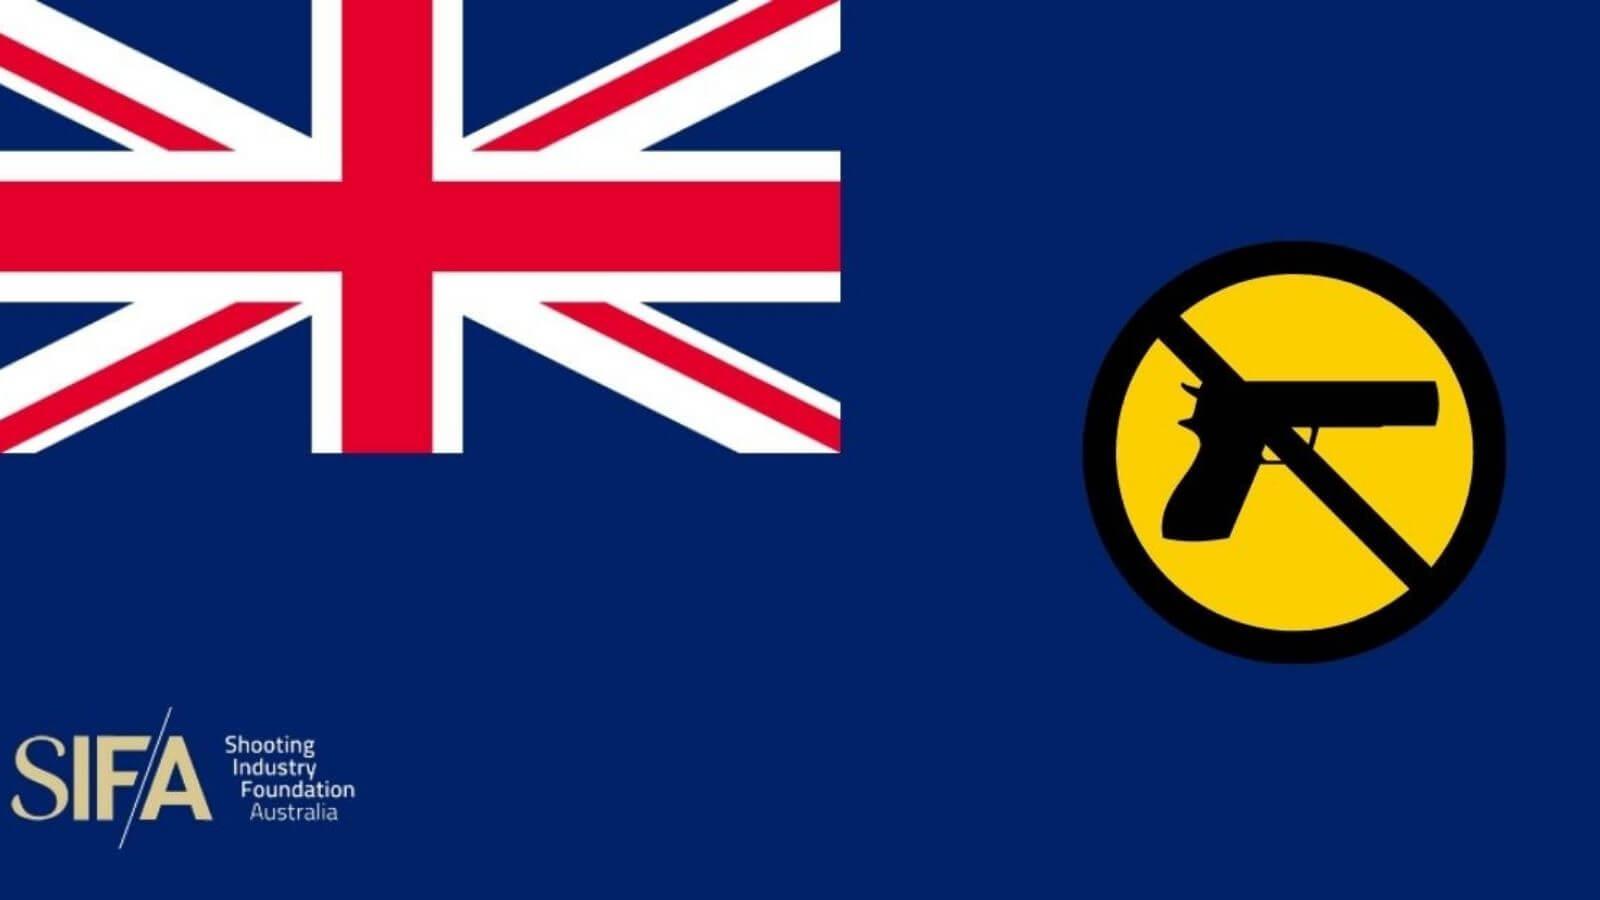 Firearms law reform on West Australian Government agenda.